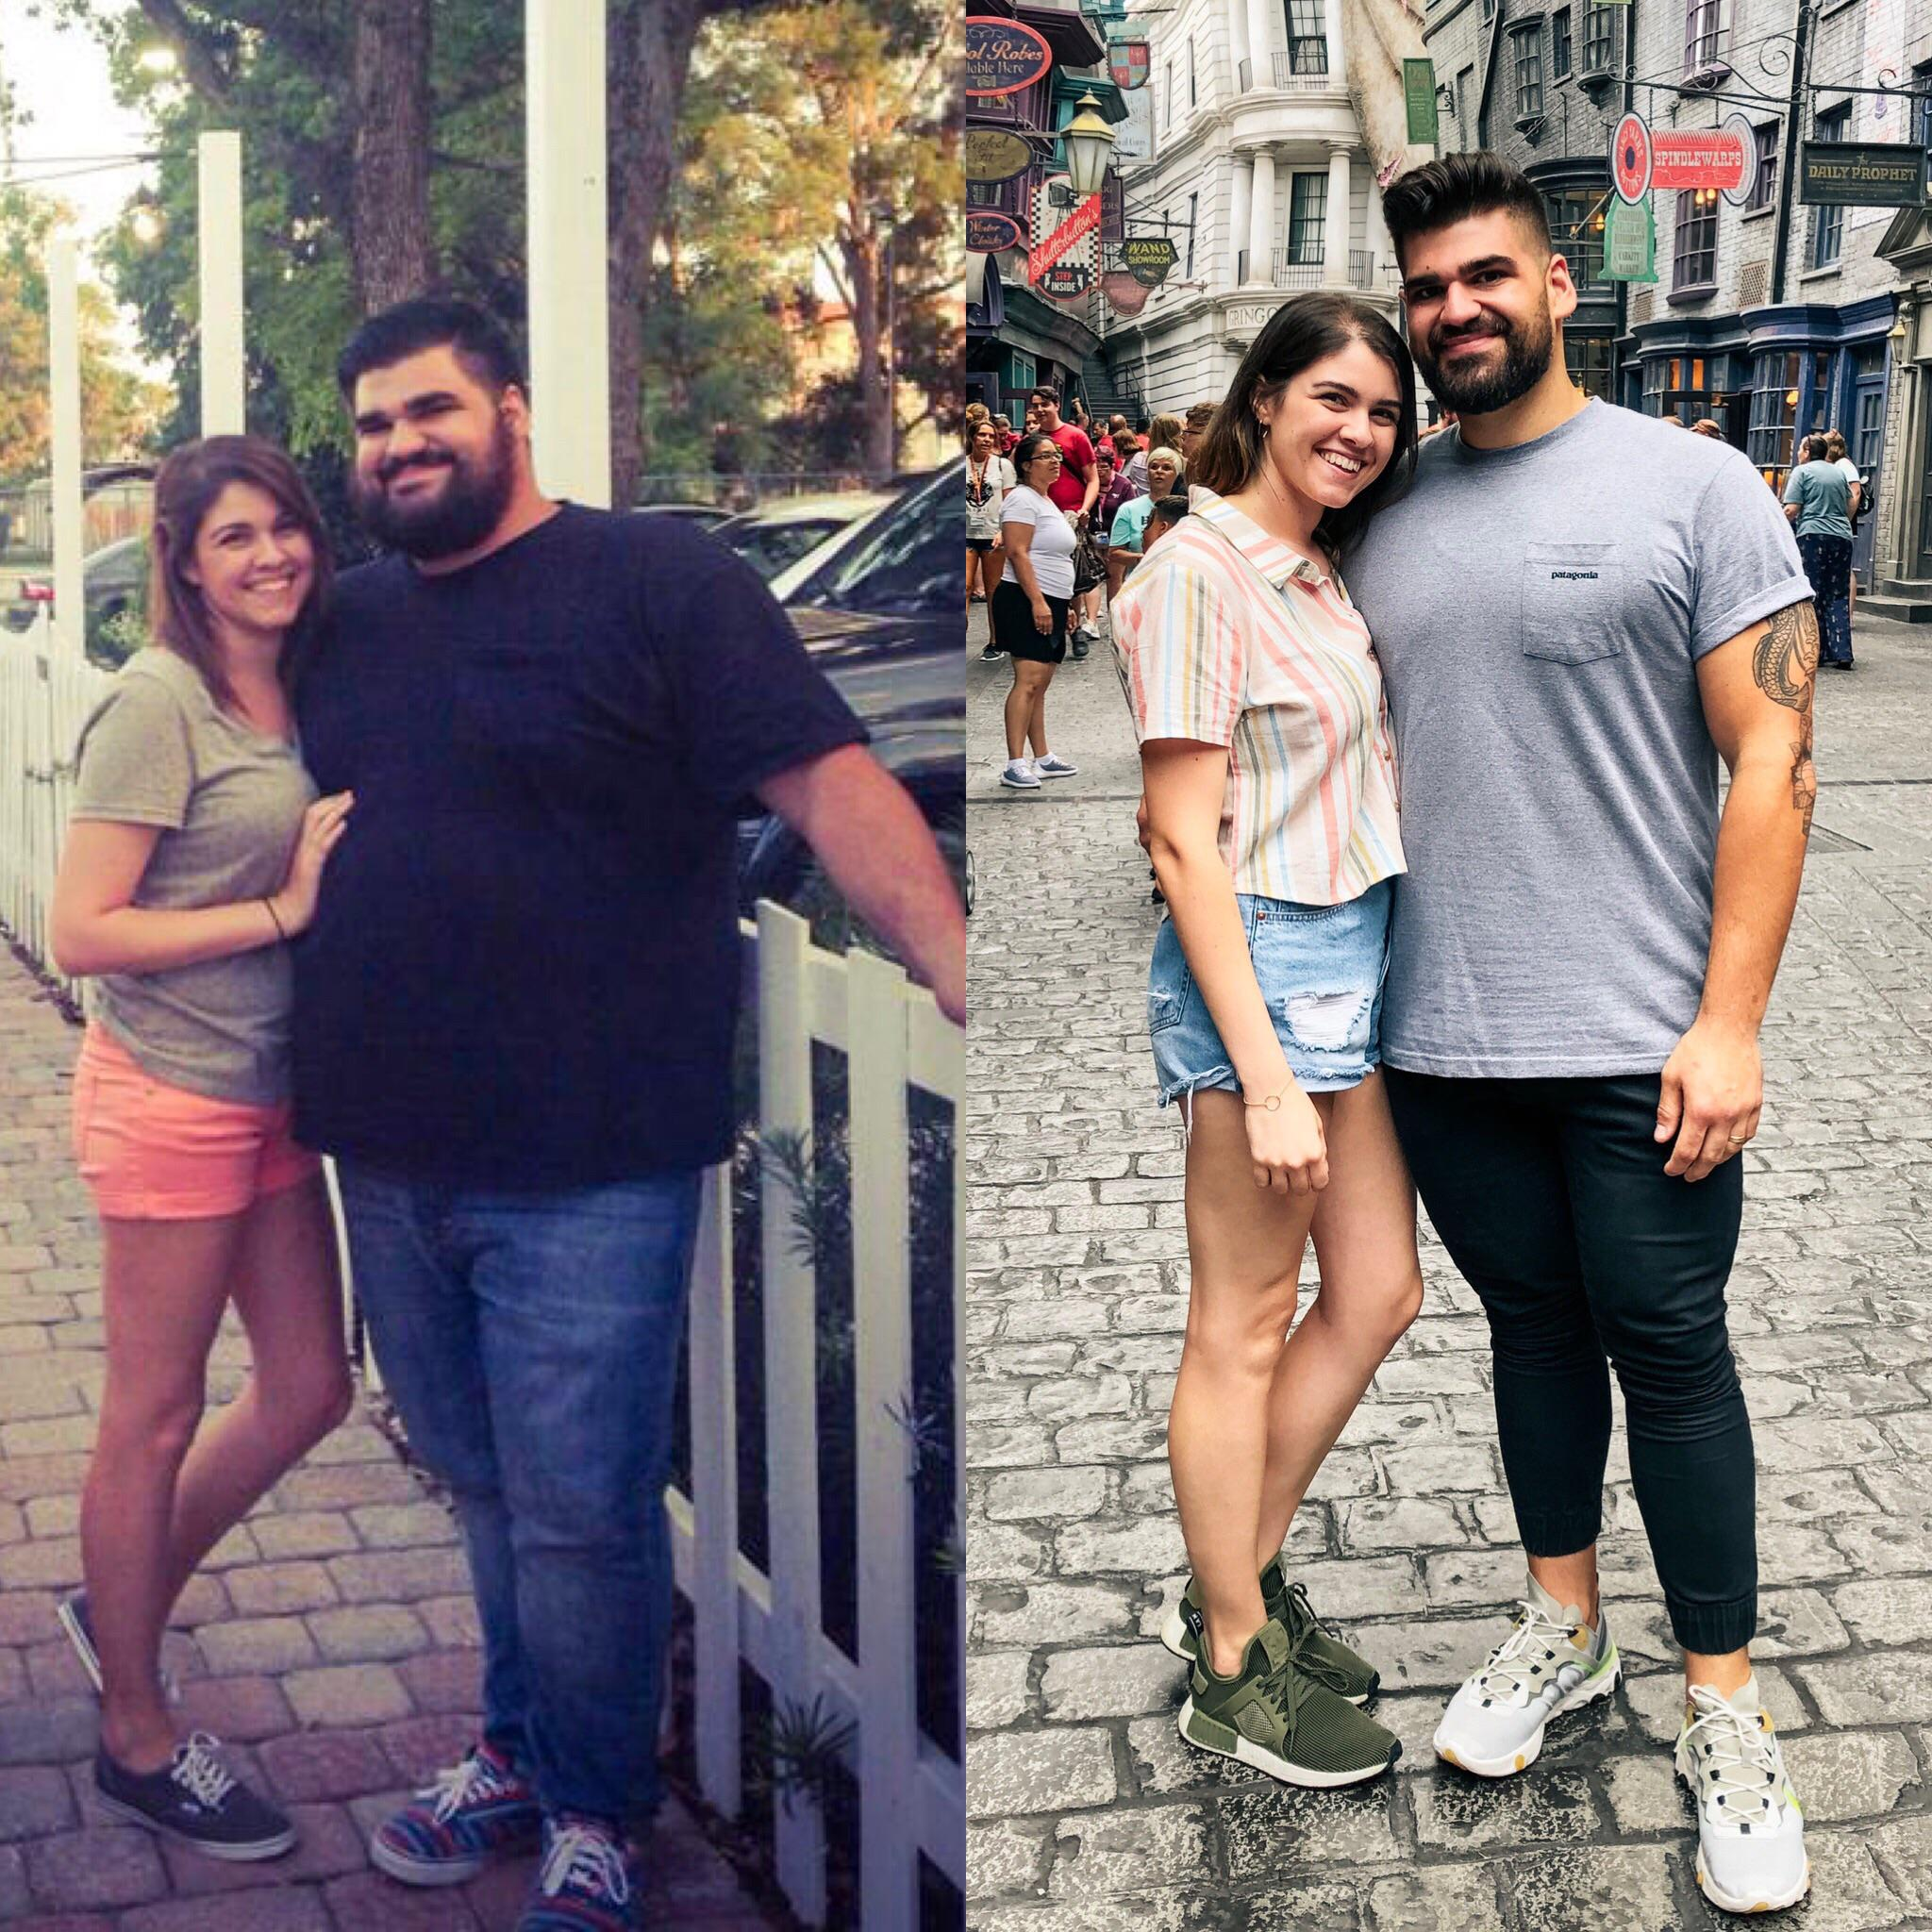 6 foot Male Progress Pics of 160 lbs Weight Loss 425 lbs to 265 lbs